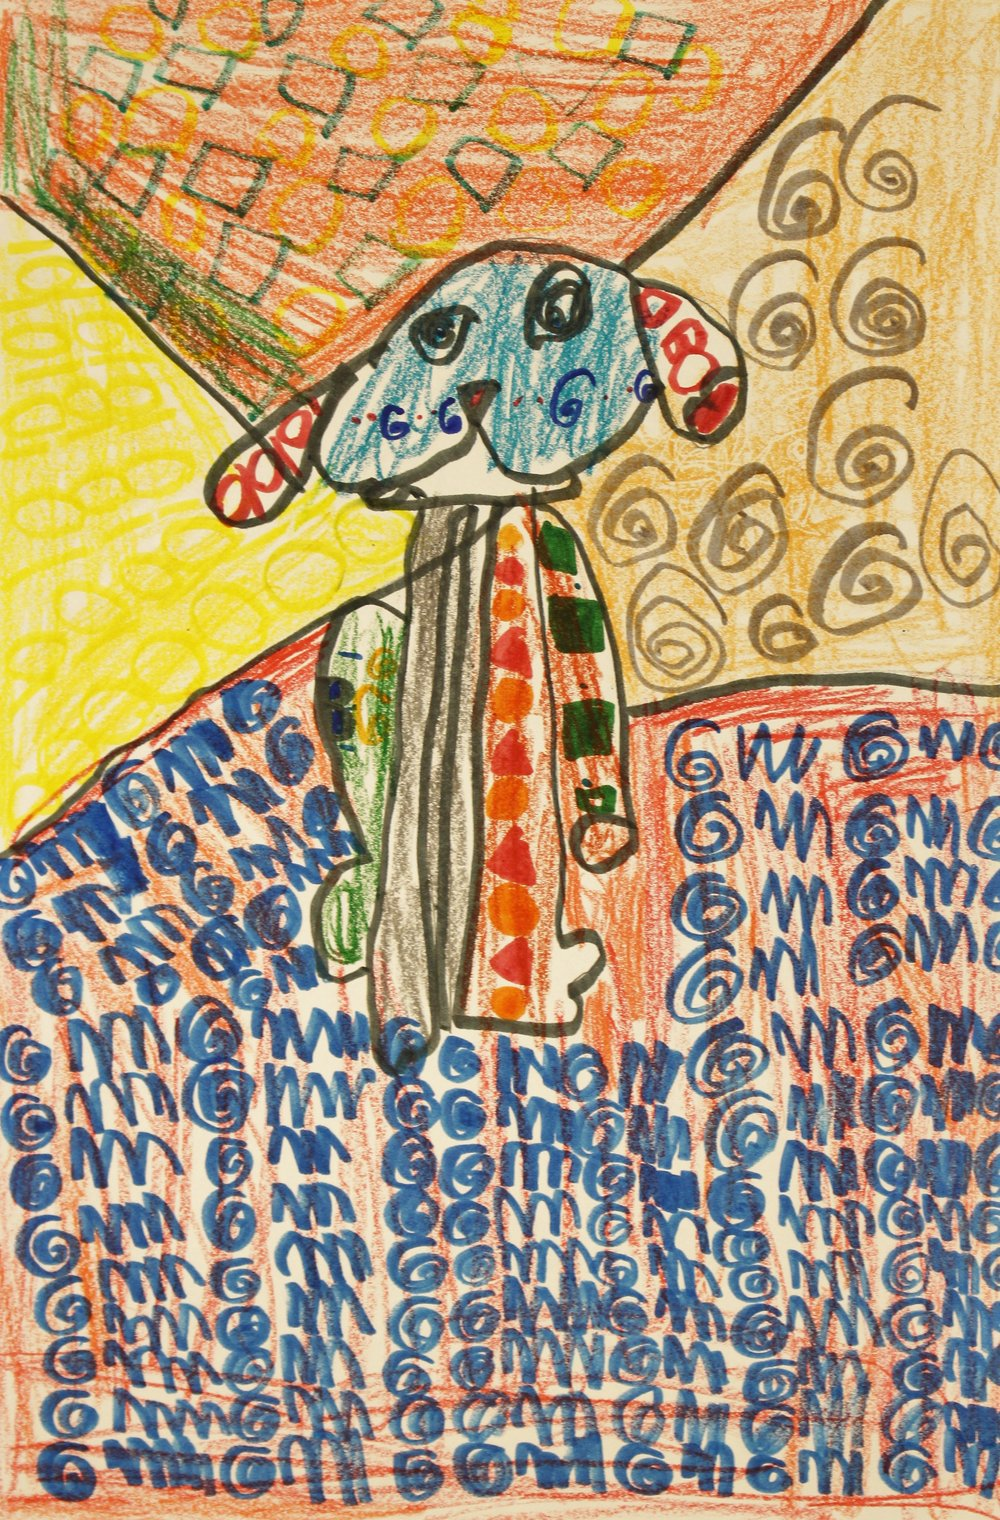 1st Grade: Ryan Coleman (Romero Britto Puppy)